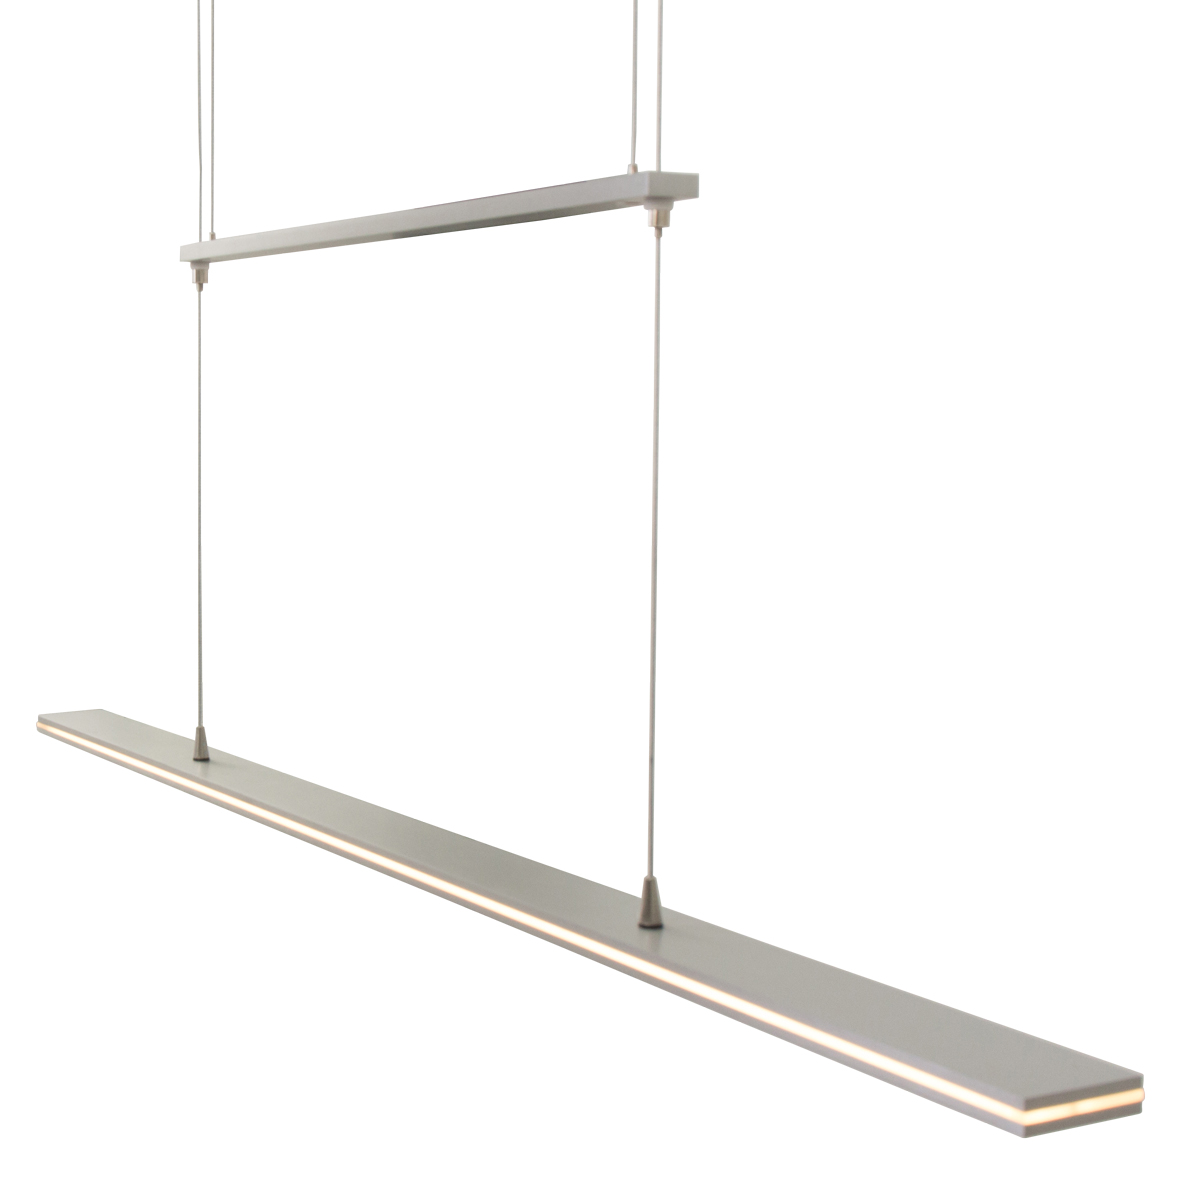 Steinhauer hanglamp wow led 7427st 100cm koop nu for Led hanglampen woonkamer